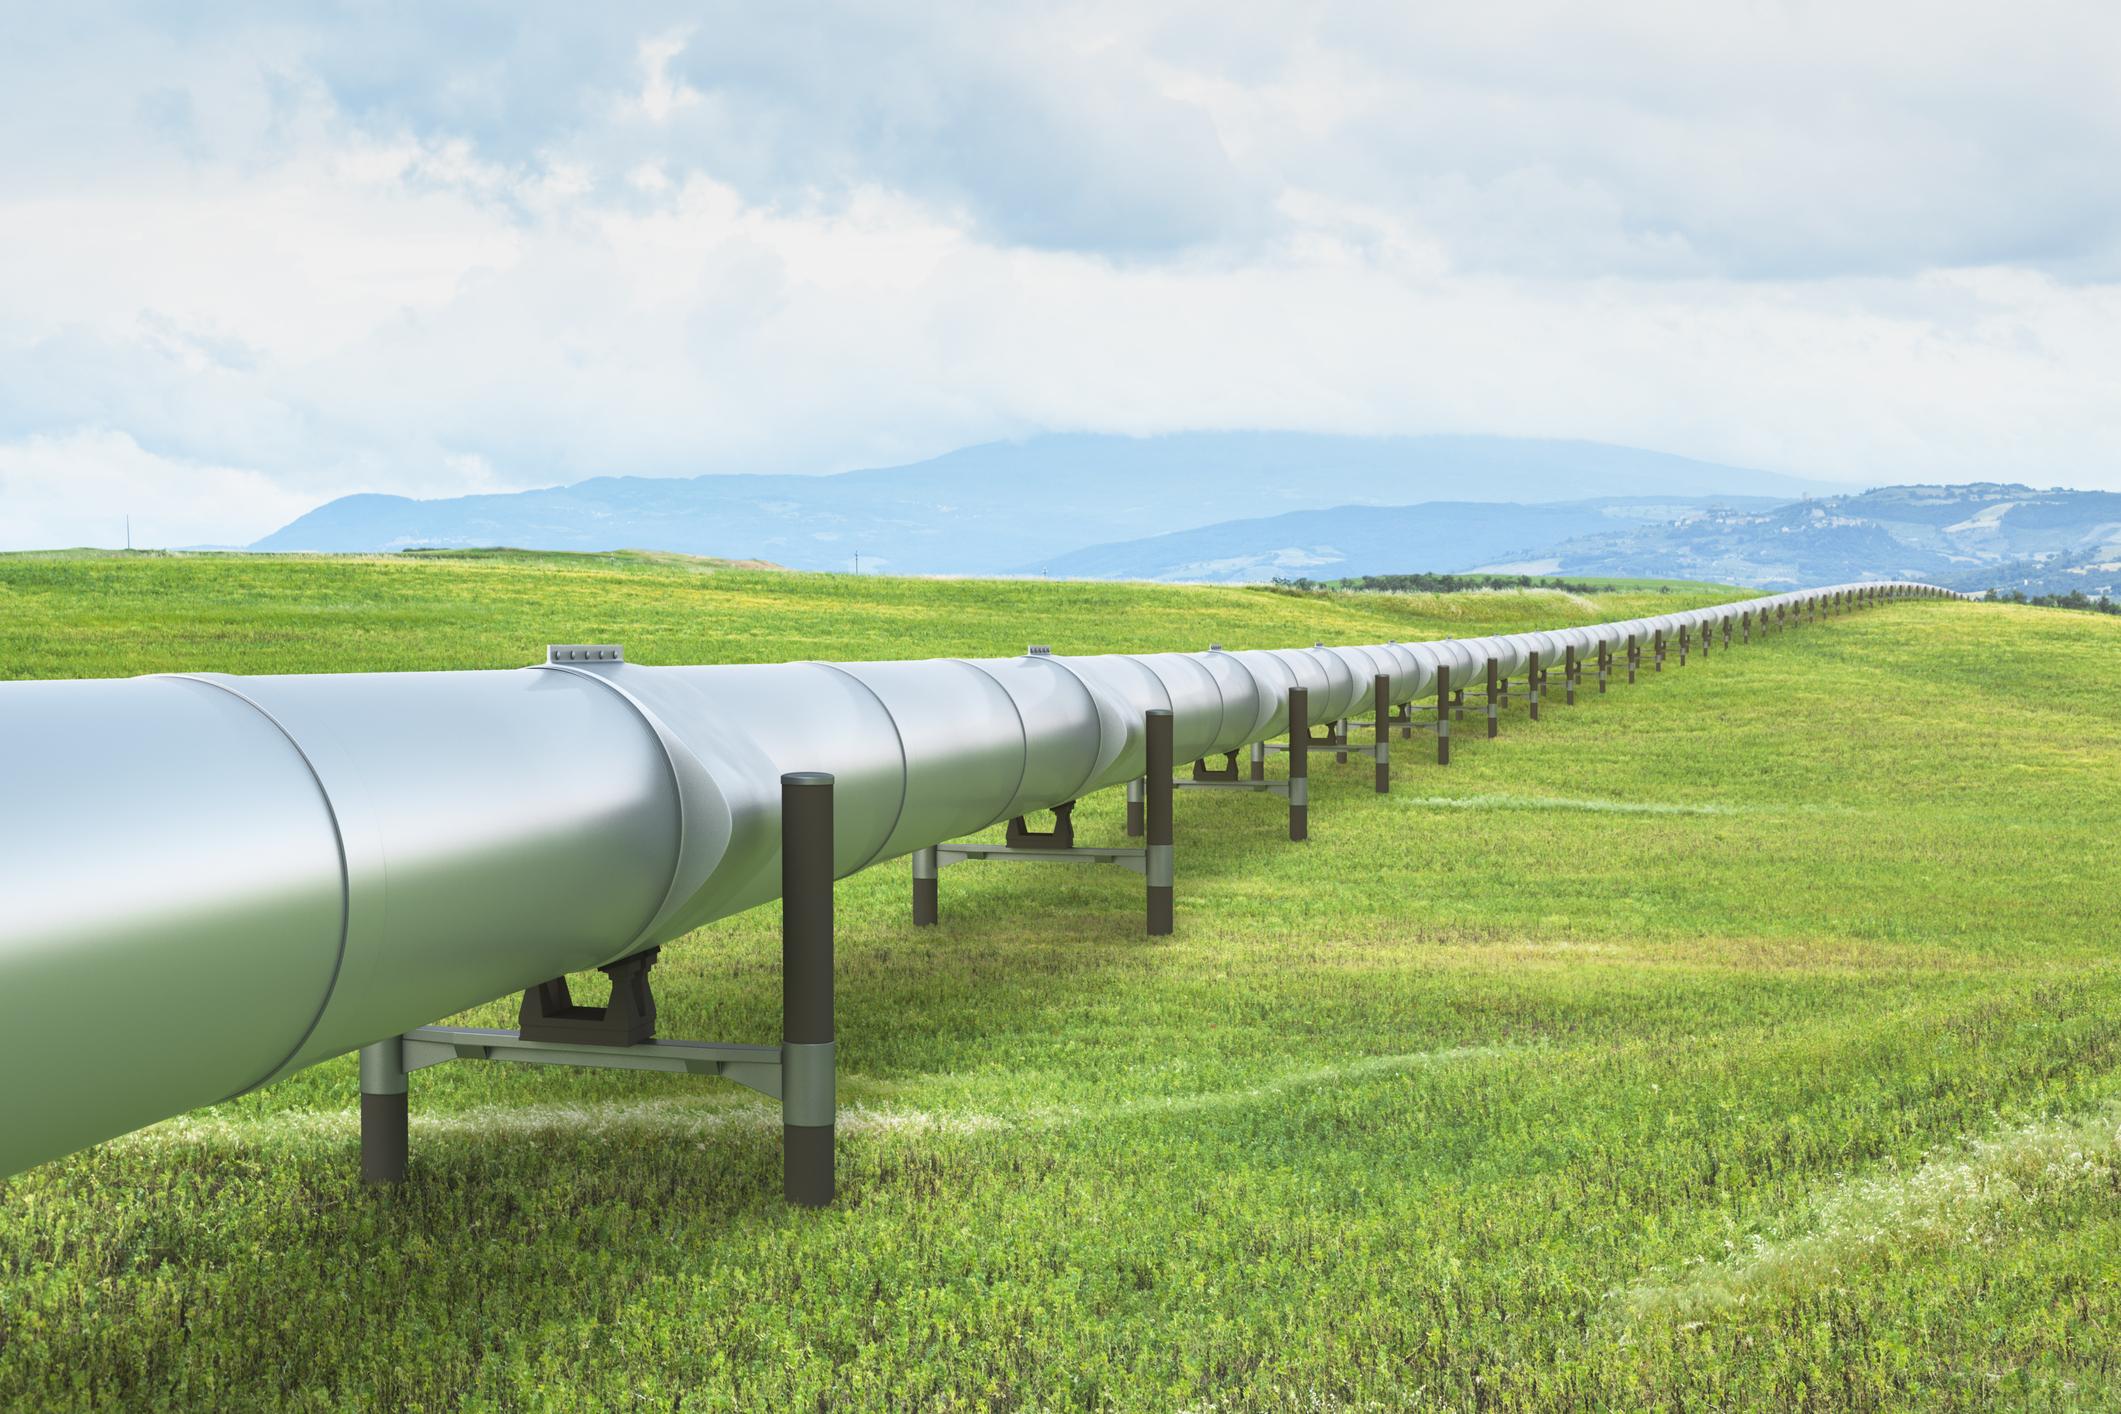 A pipeline going across a green field.